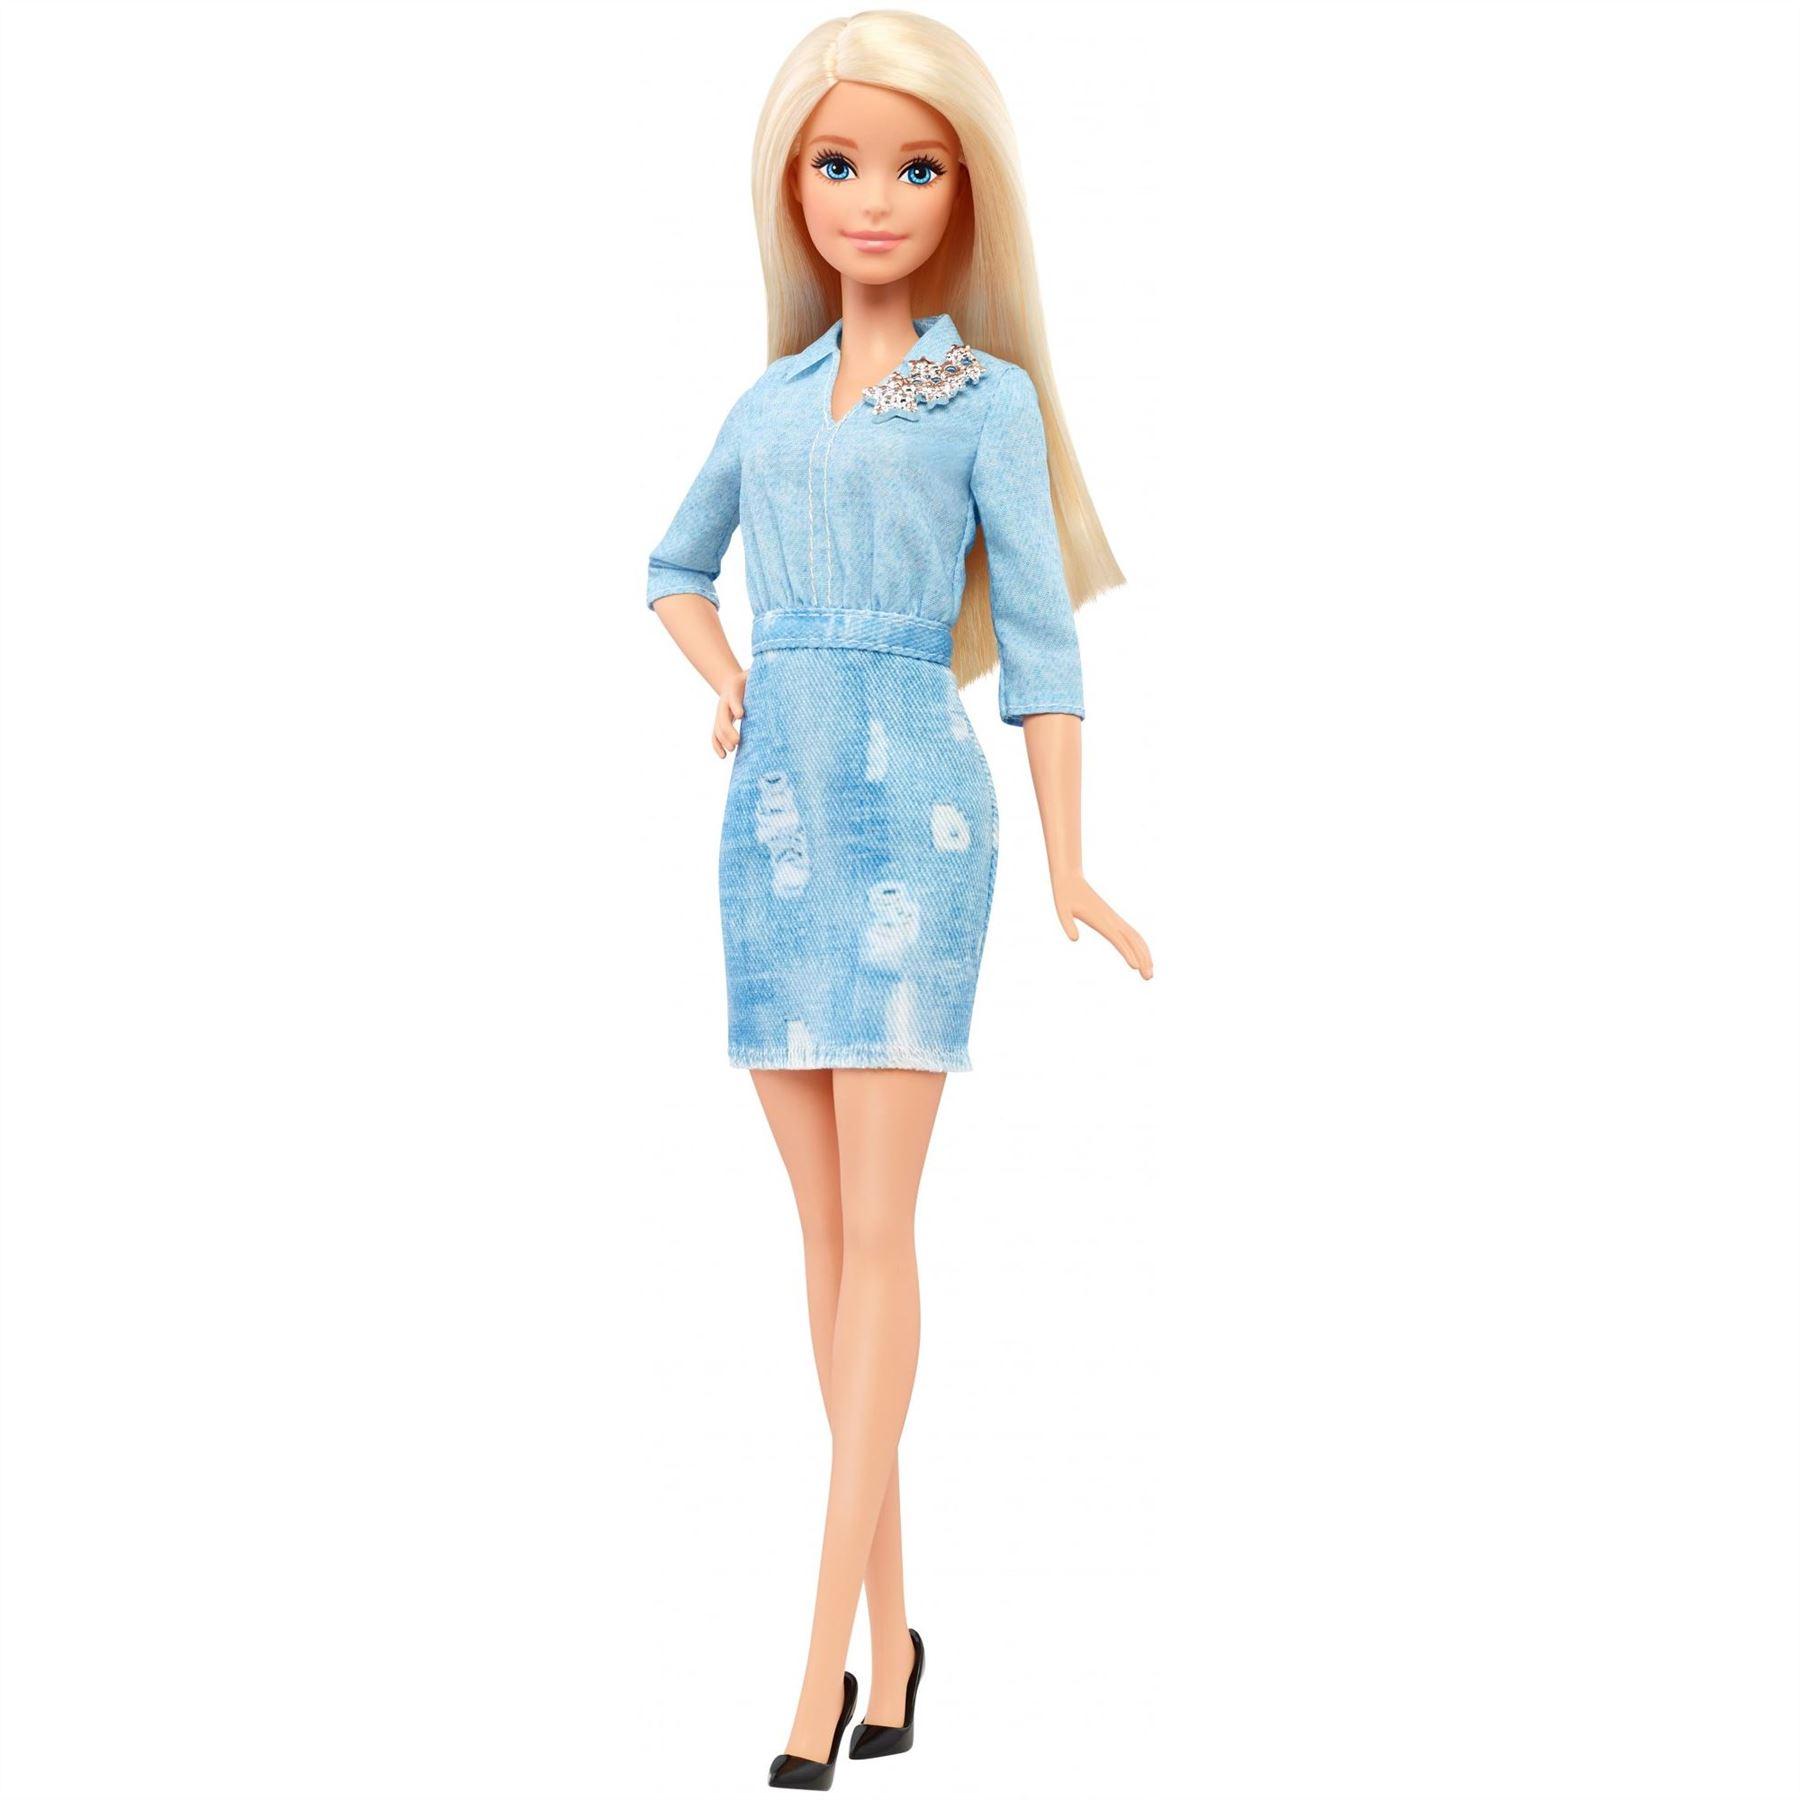 Barbie Fashionista Doll Daisy Denim Polka Dot Petite